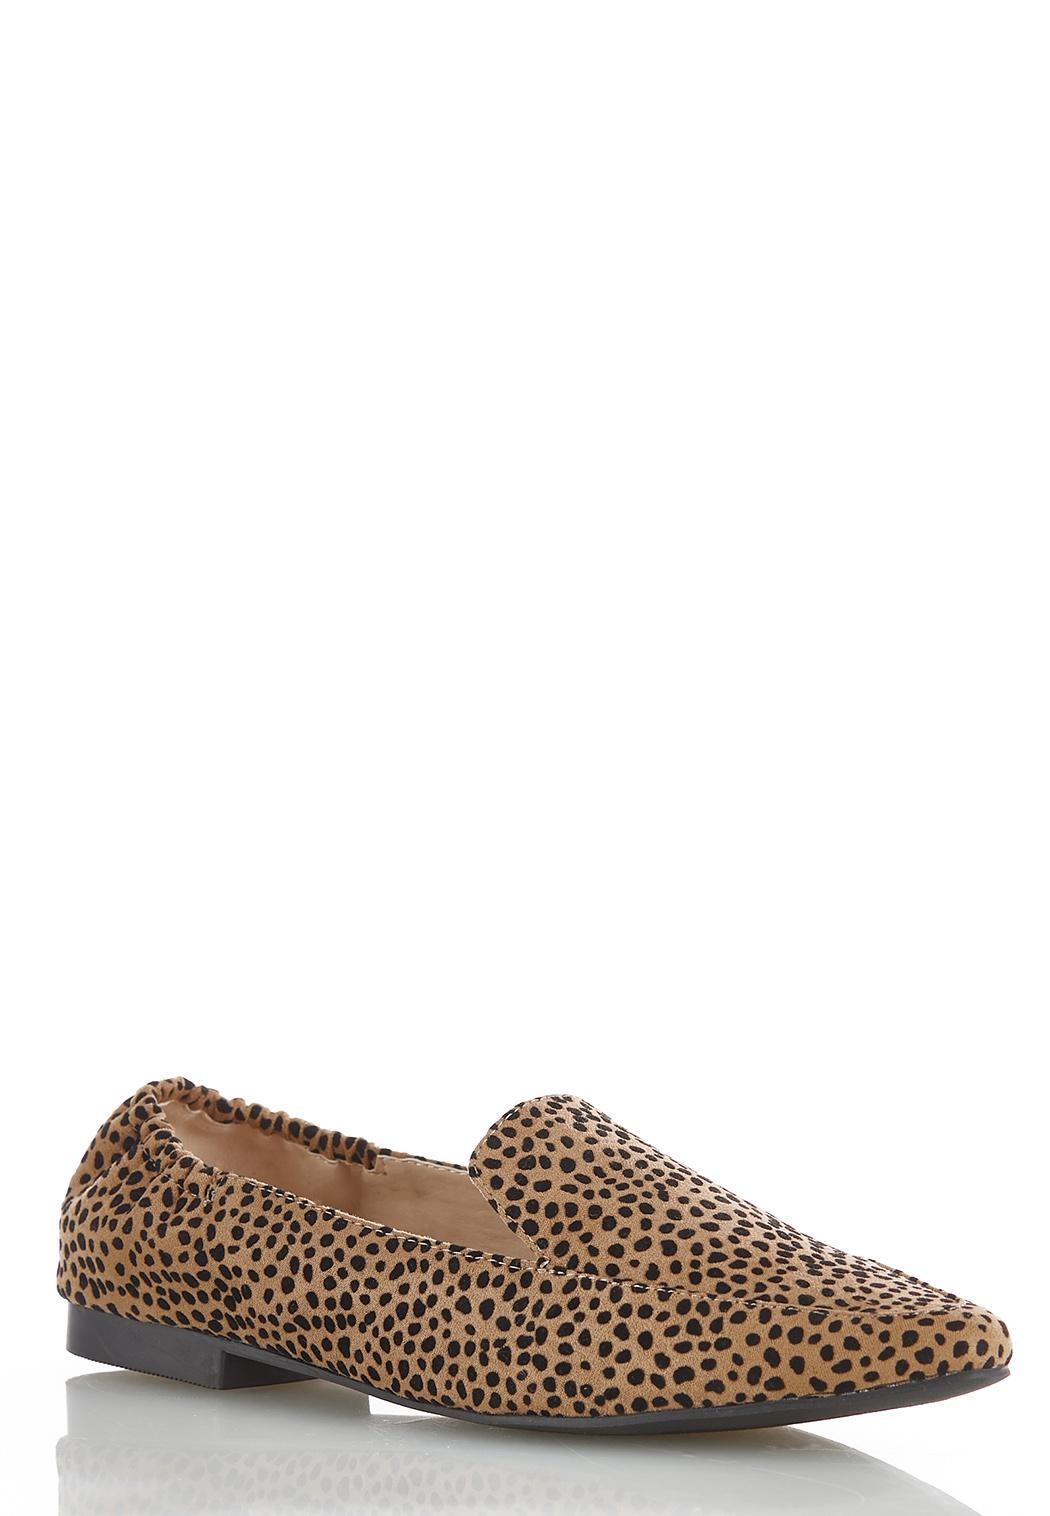 Faux Suede Cheetah Flats